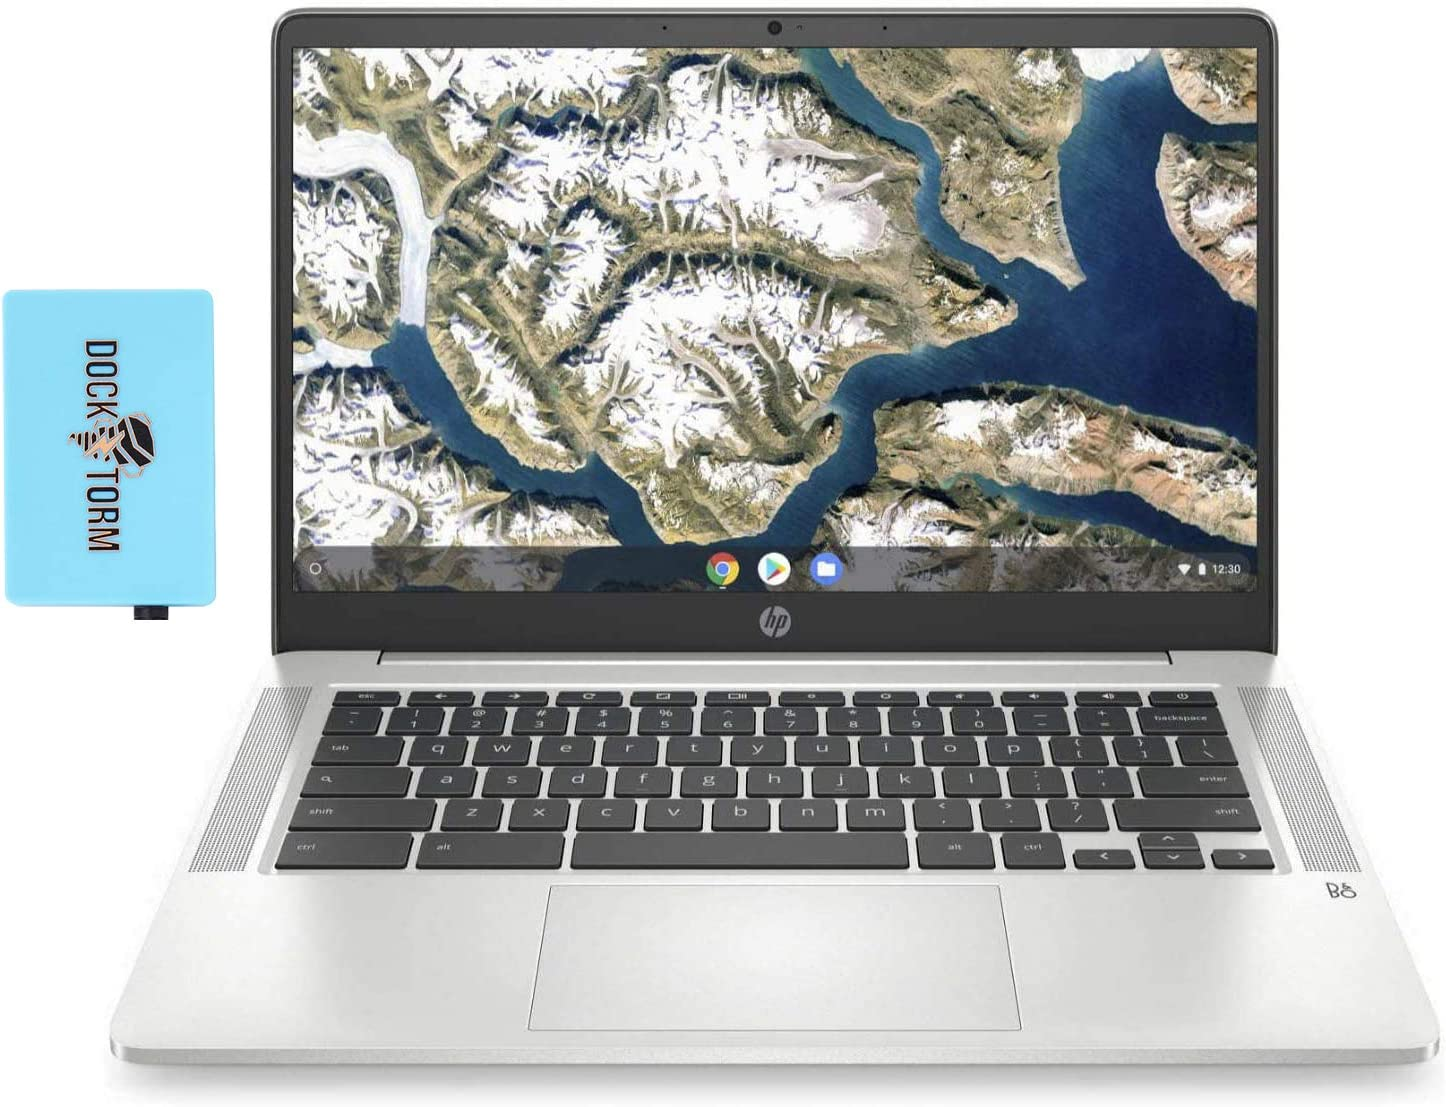 HP Chromebook - 14a-na0023cl Everyday Value Laptop (Intel Celeron N4000 2-Core, 4GB RAM, 64GB eMMC, Intel UHD 600, 14.0